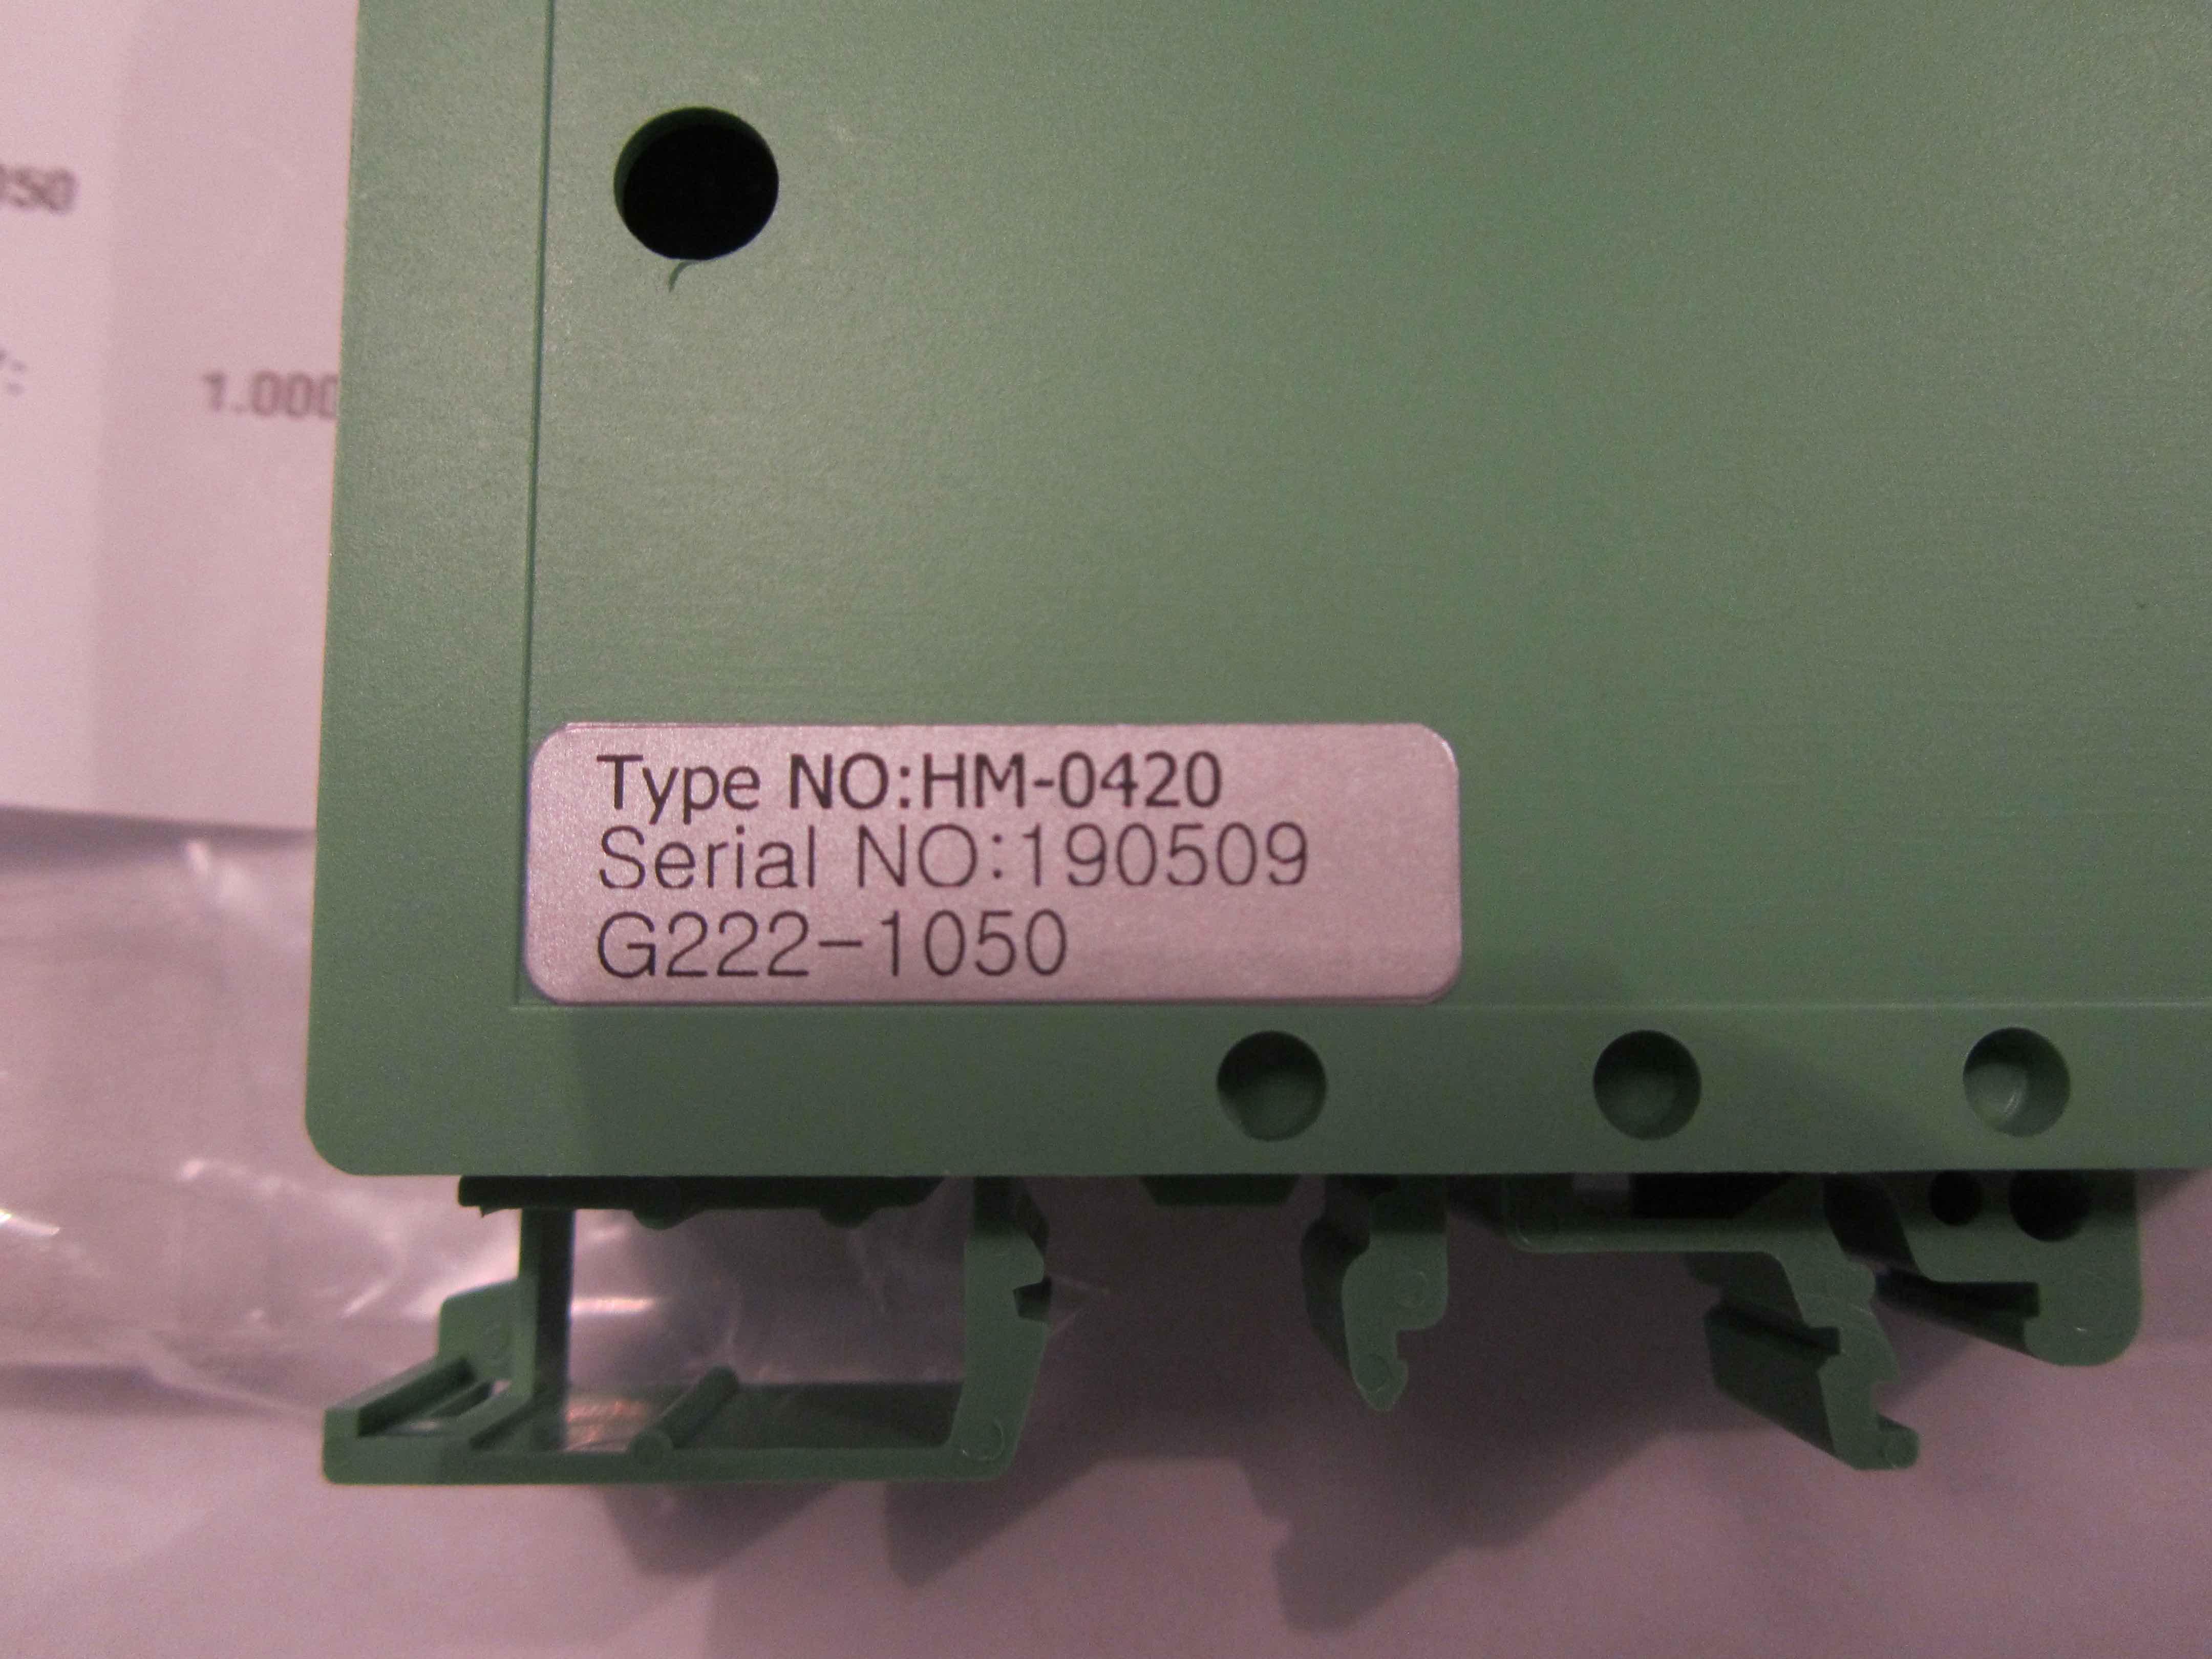 Type No- HM-0420 G222-1050